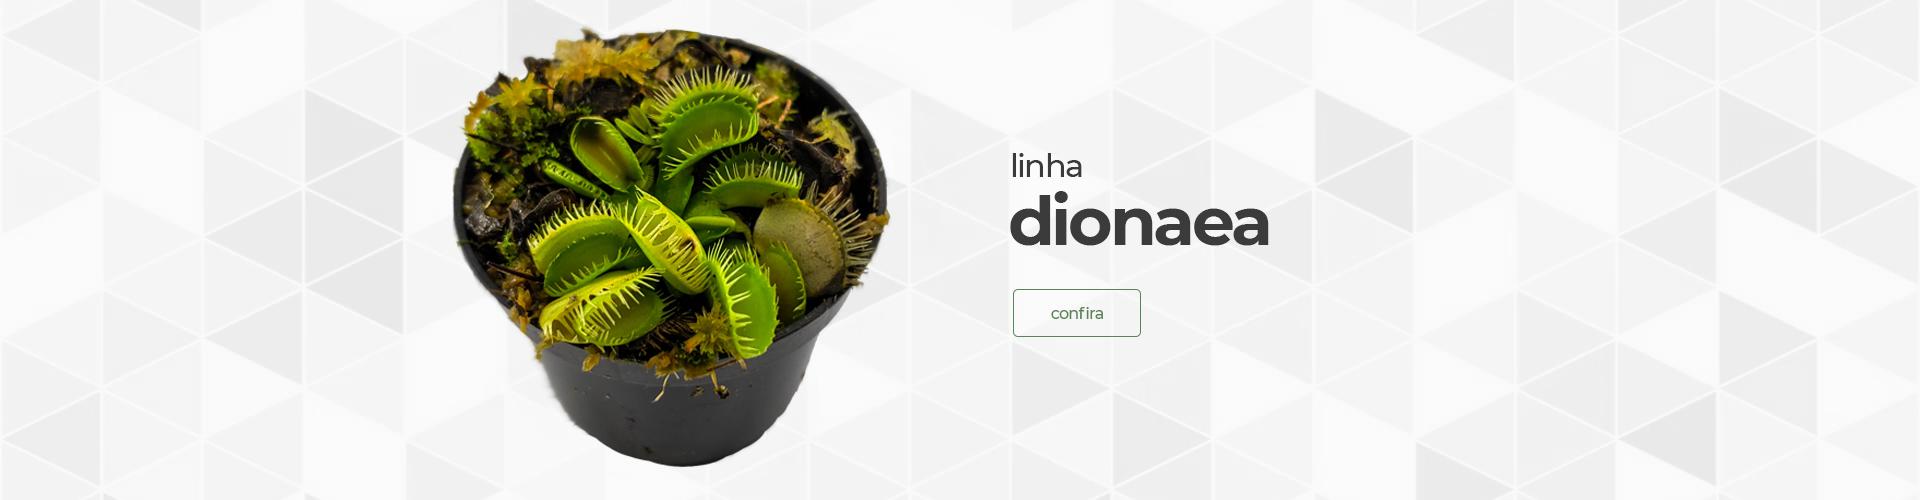 Dionaeas